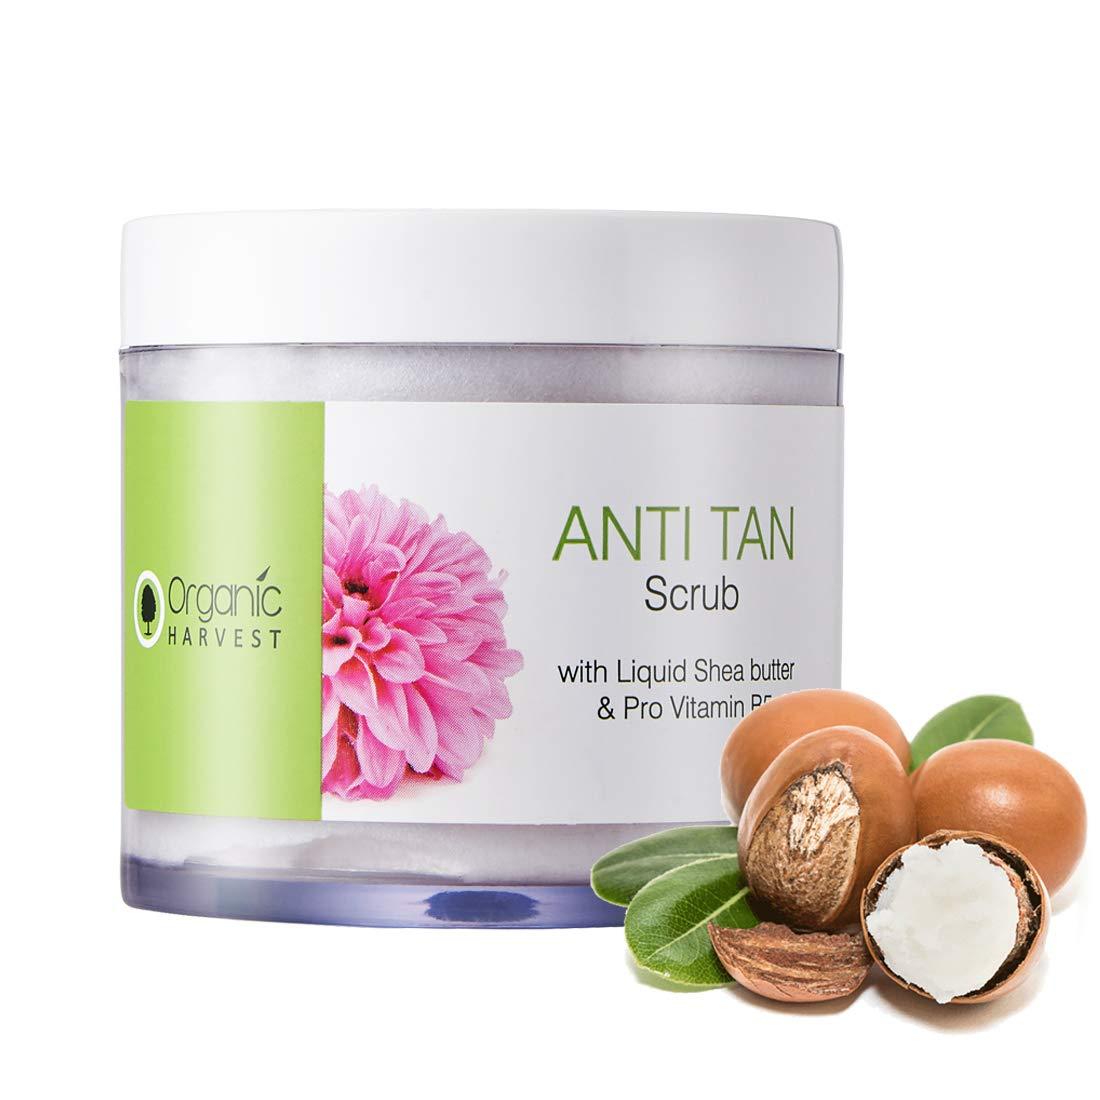 Organic Harvest | Anti Tan Scrub - 100g